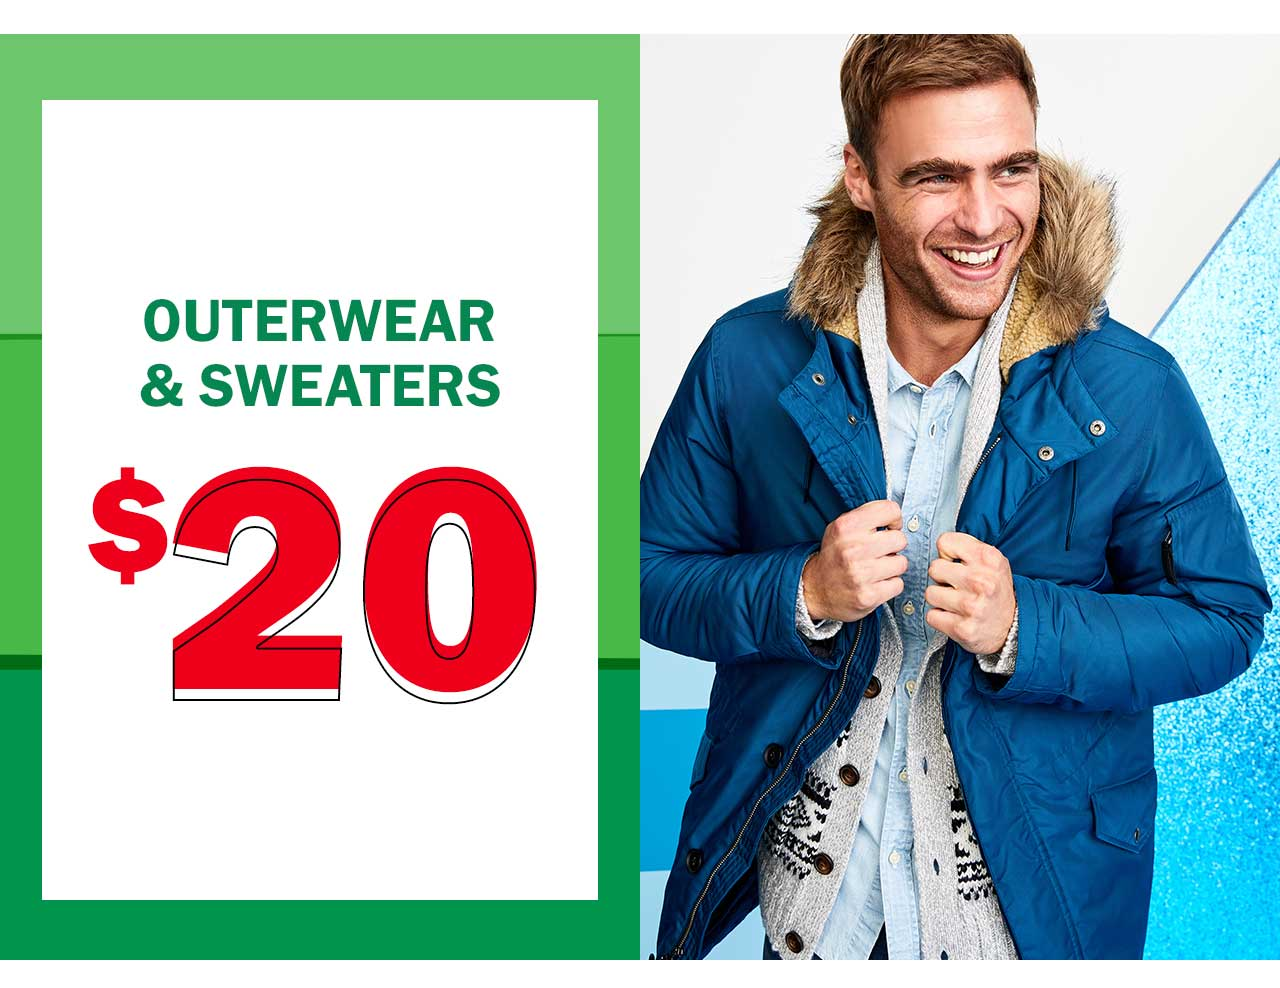 Outerwear & sweaters $20